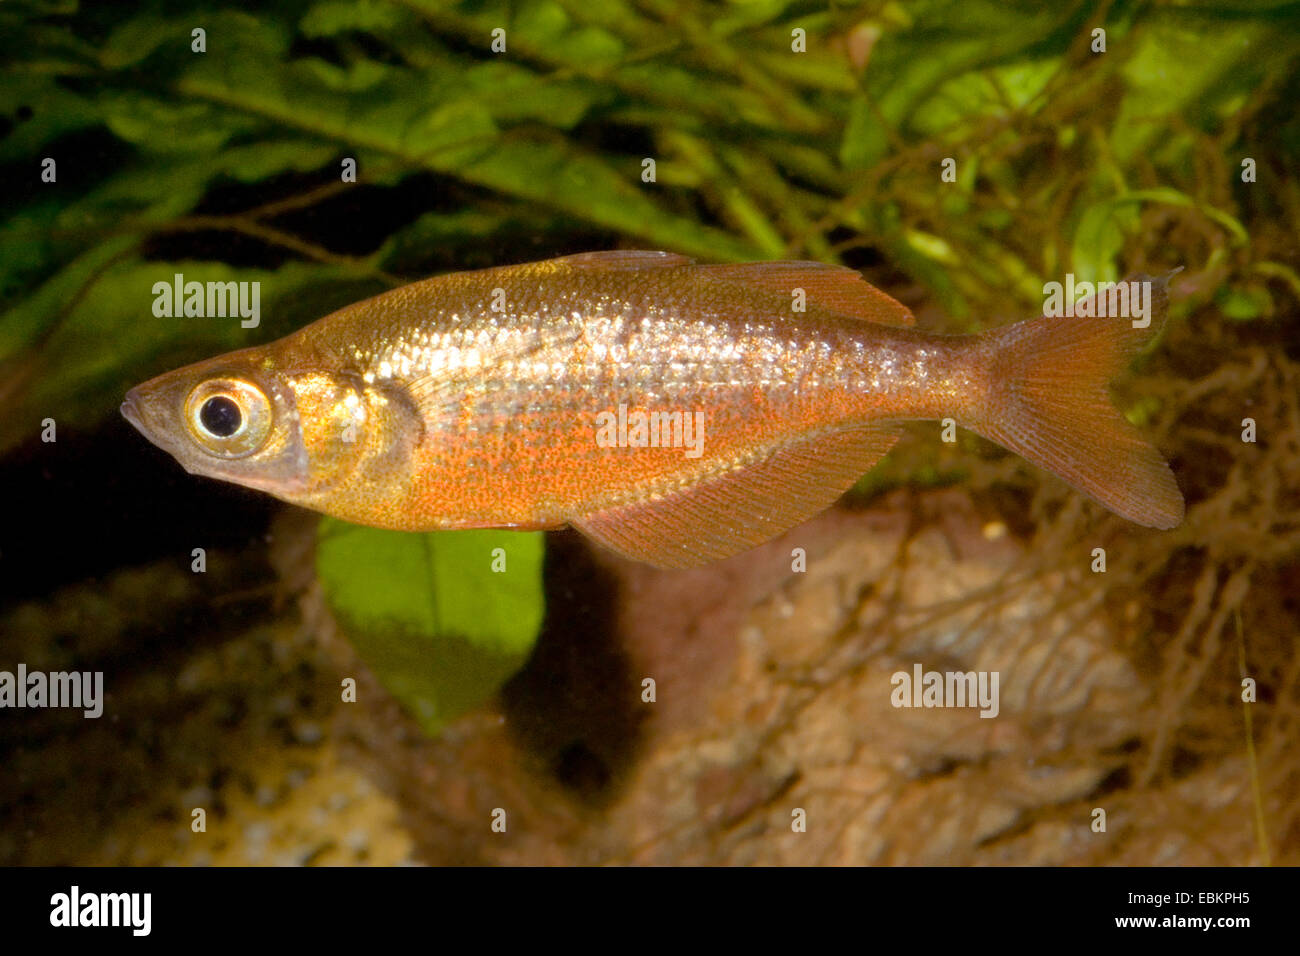 Rojo, Rojo Salmón Rainbowfish rainbowfish (Glossolepis incisus), hembra, KZLU1007 Imagen De Stock